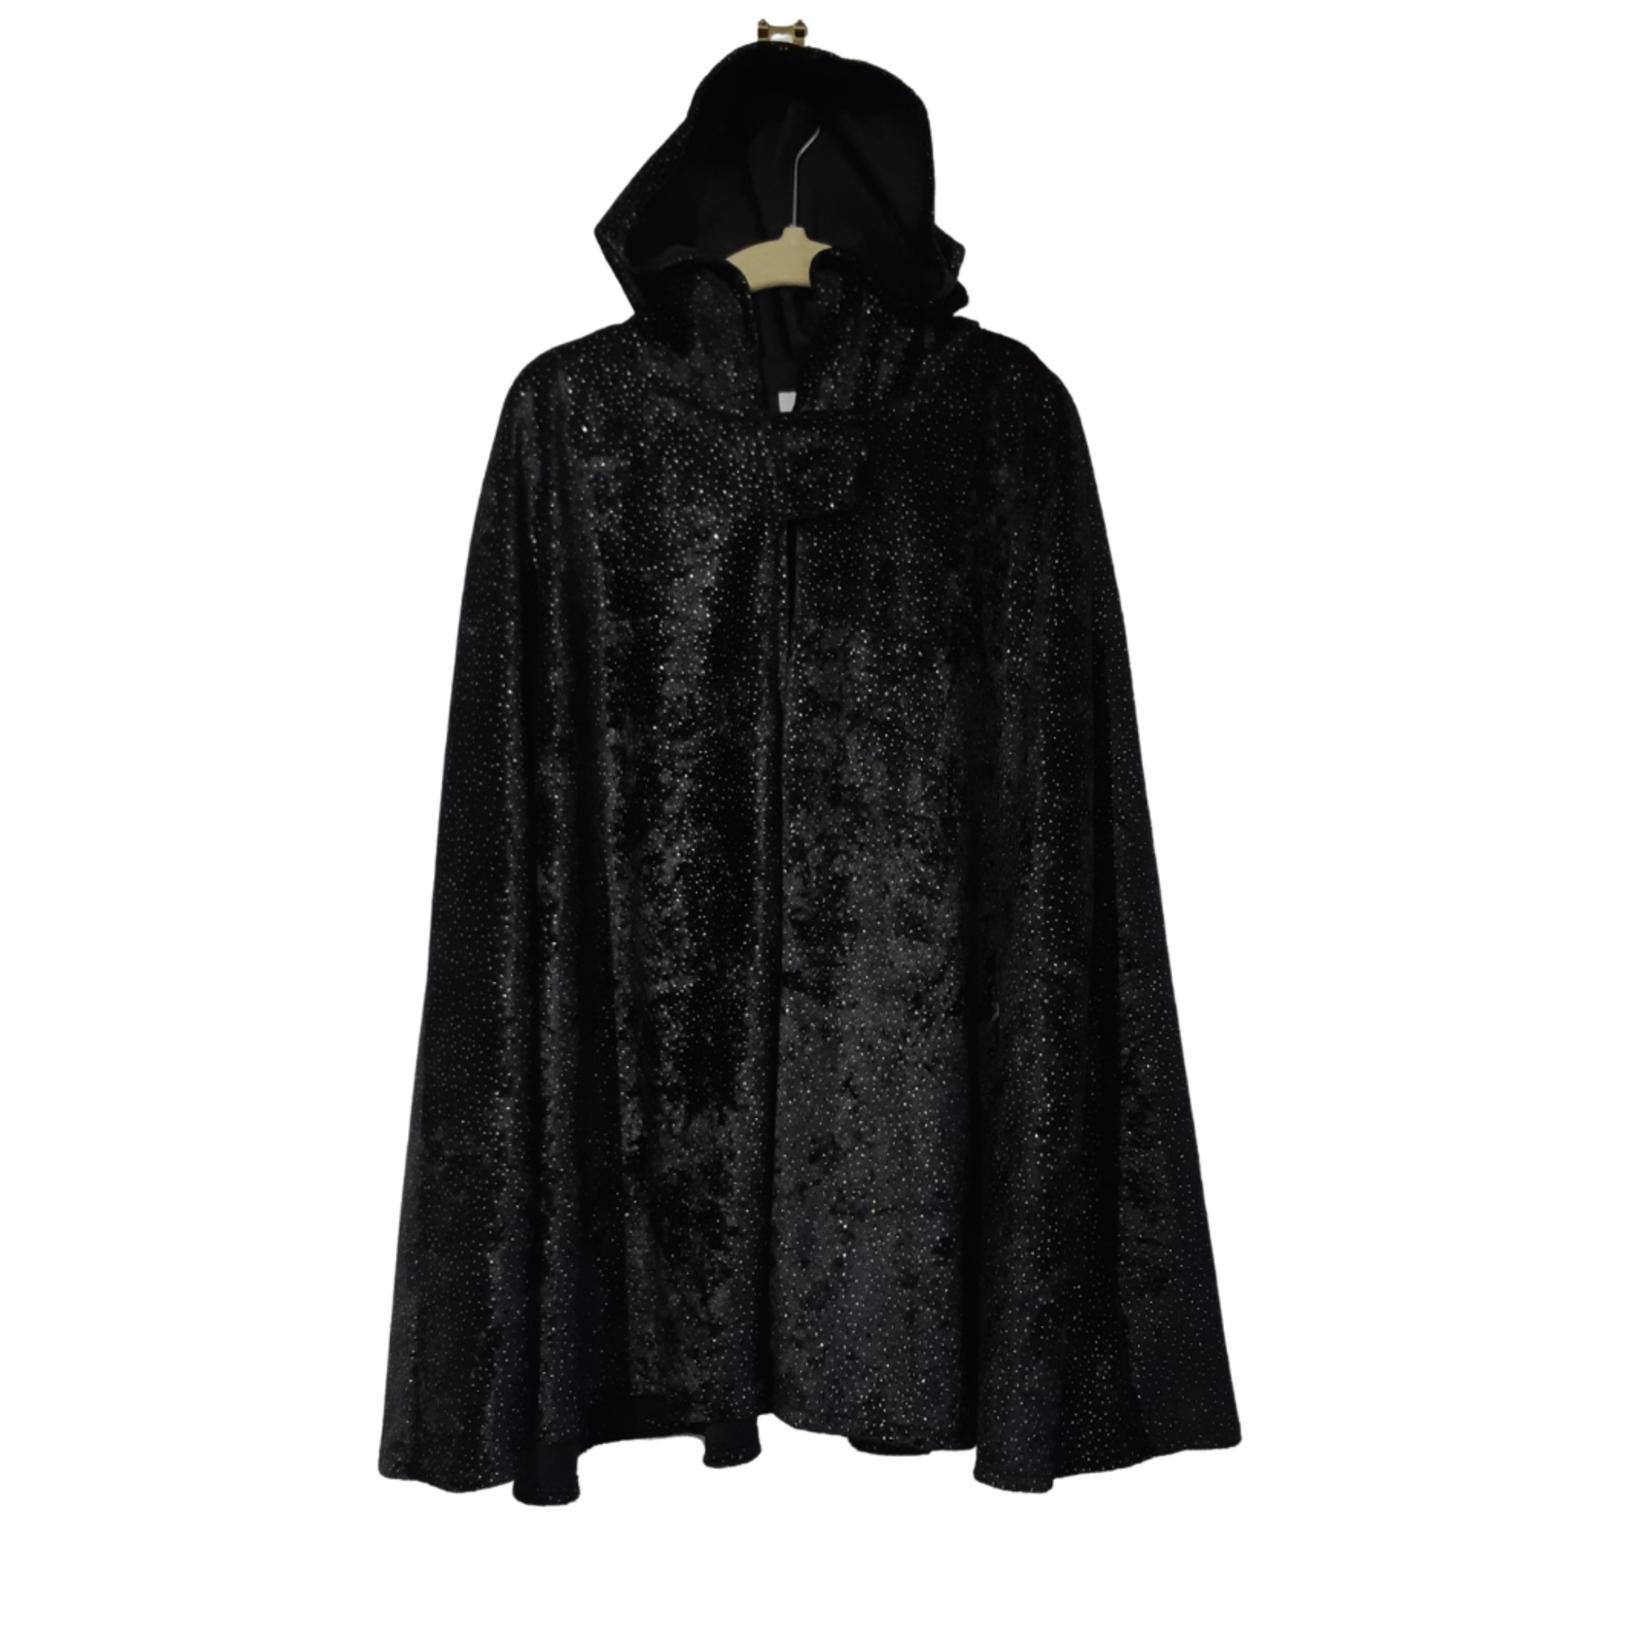 Wacky Wardrobe Wacky Wardrobe Cape Black Speckle - Medium